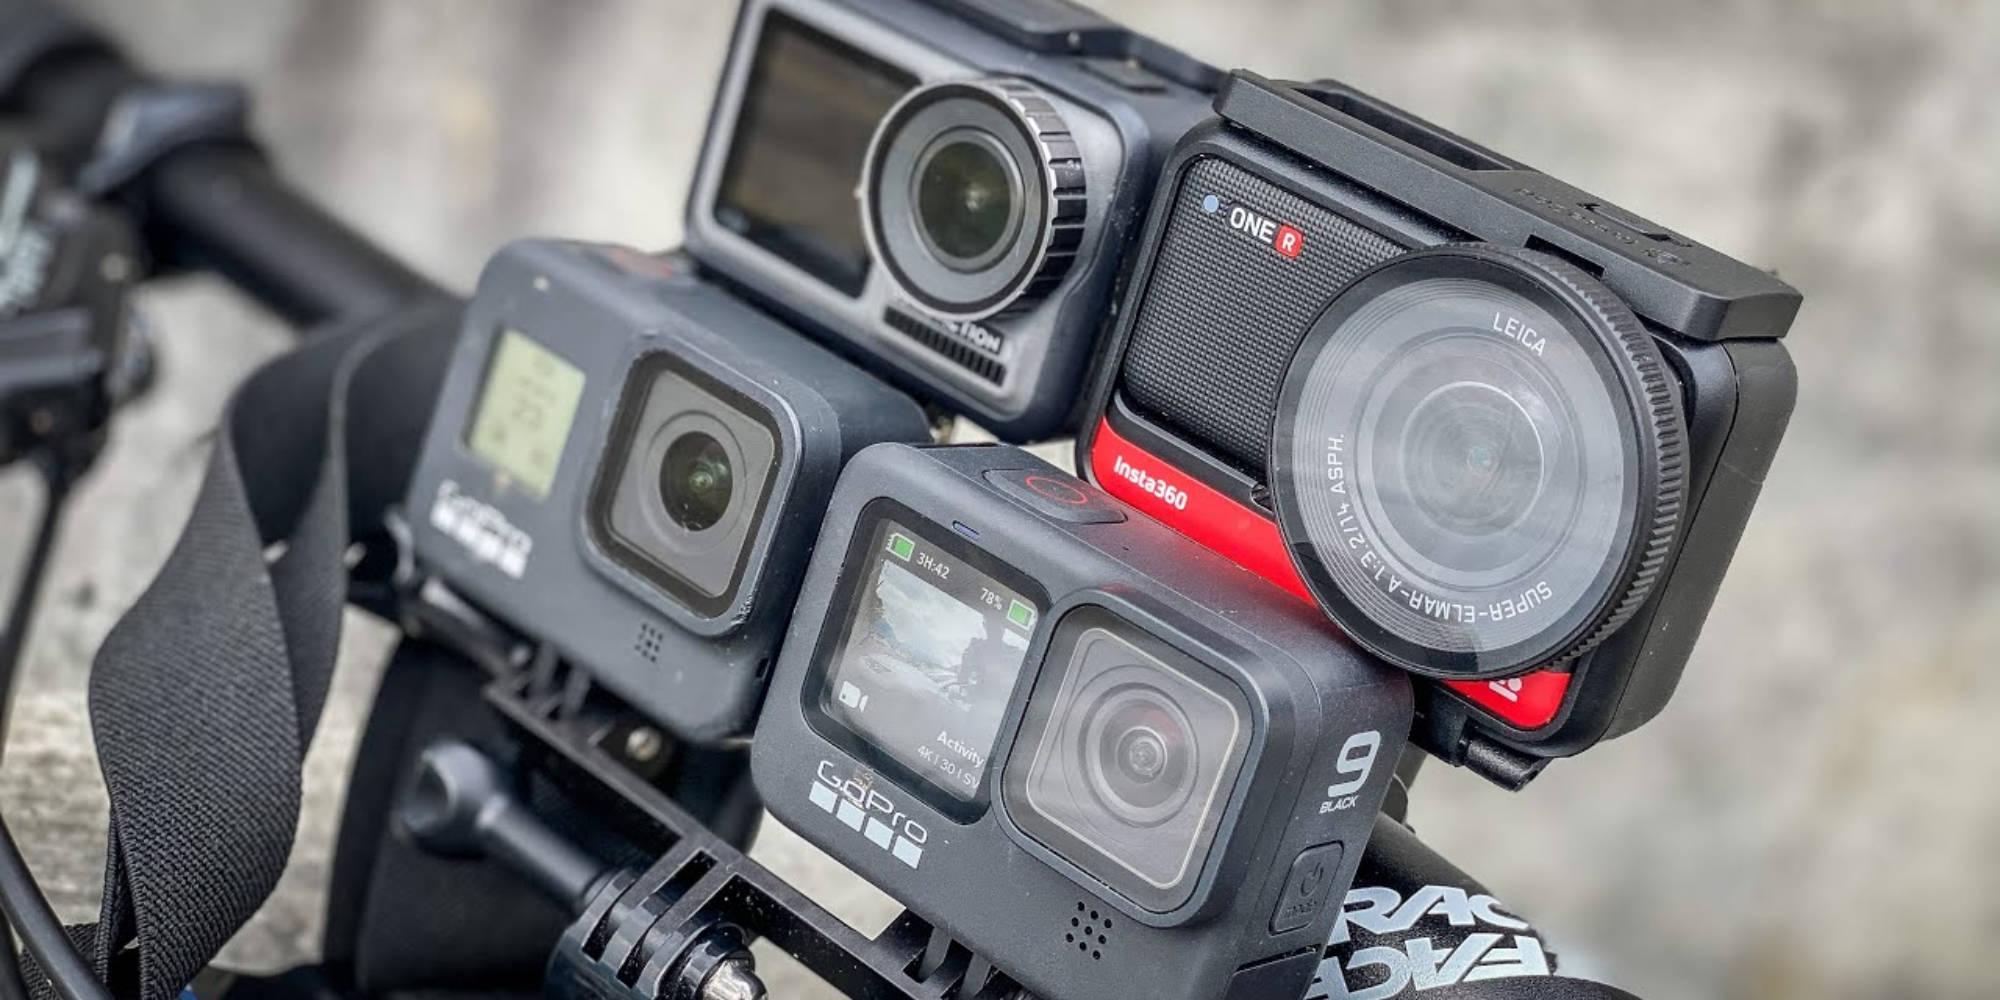 Must-watch GoPro 9 comparisons, HyperSmooth 3.0 footage - DroneDJ